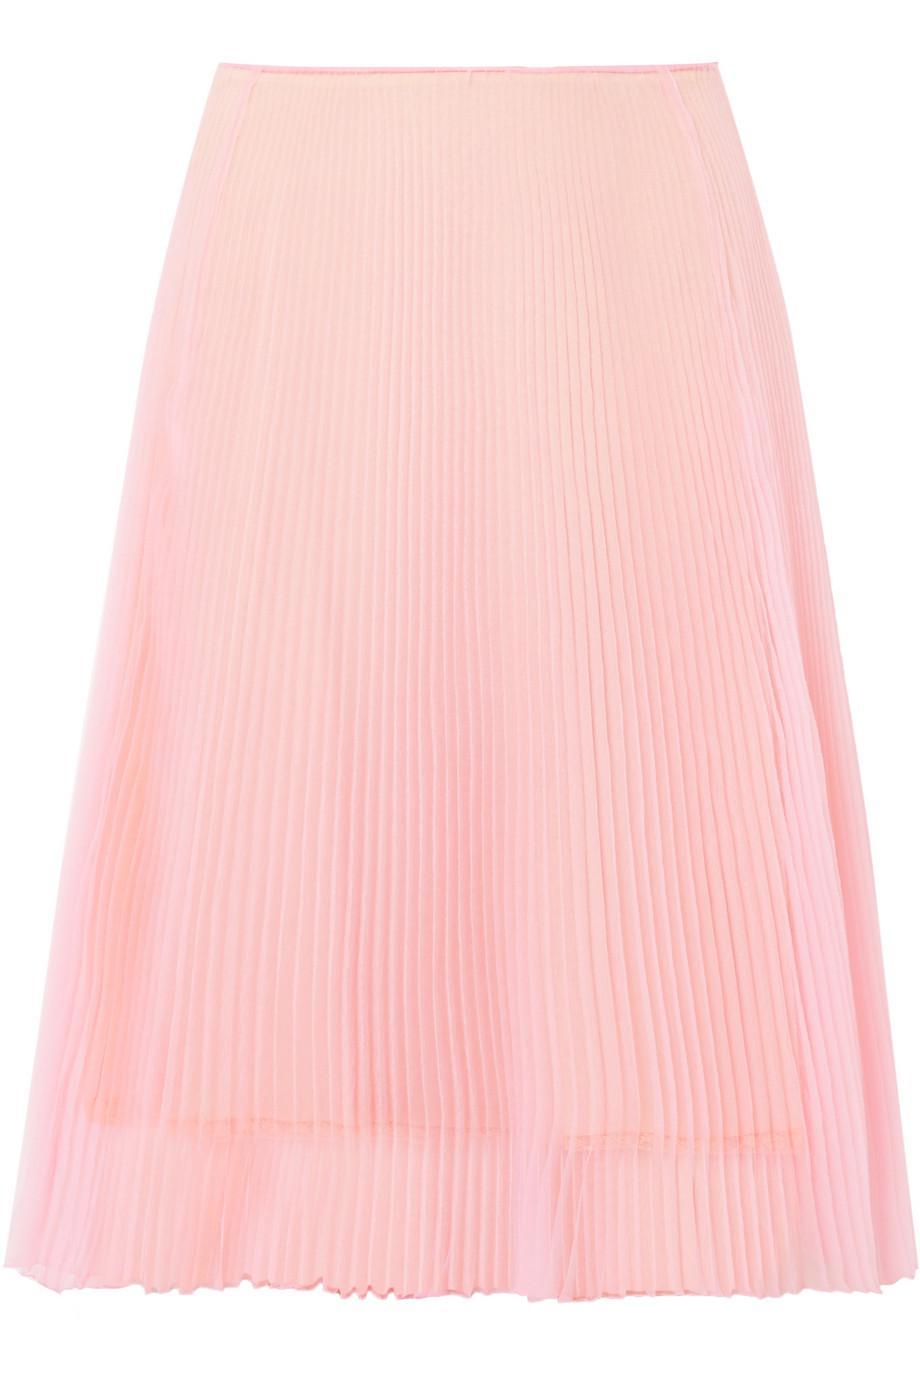 Plissé-organza Skirt - Black Prada Cheap Price Low Shipping Fee Perfect Sale Online Perfect Online Buy Cheap Best Place Fast Shipping ZuKn34vbp